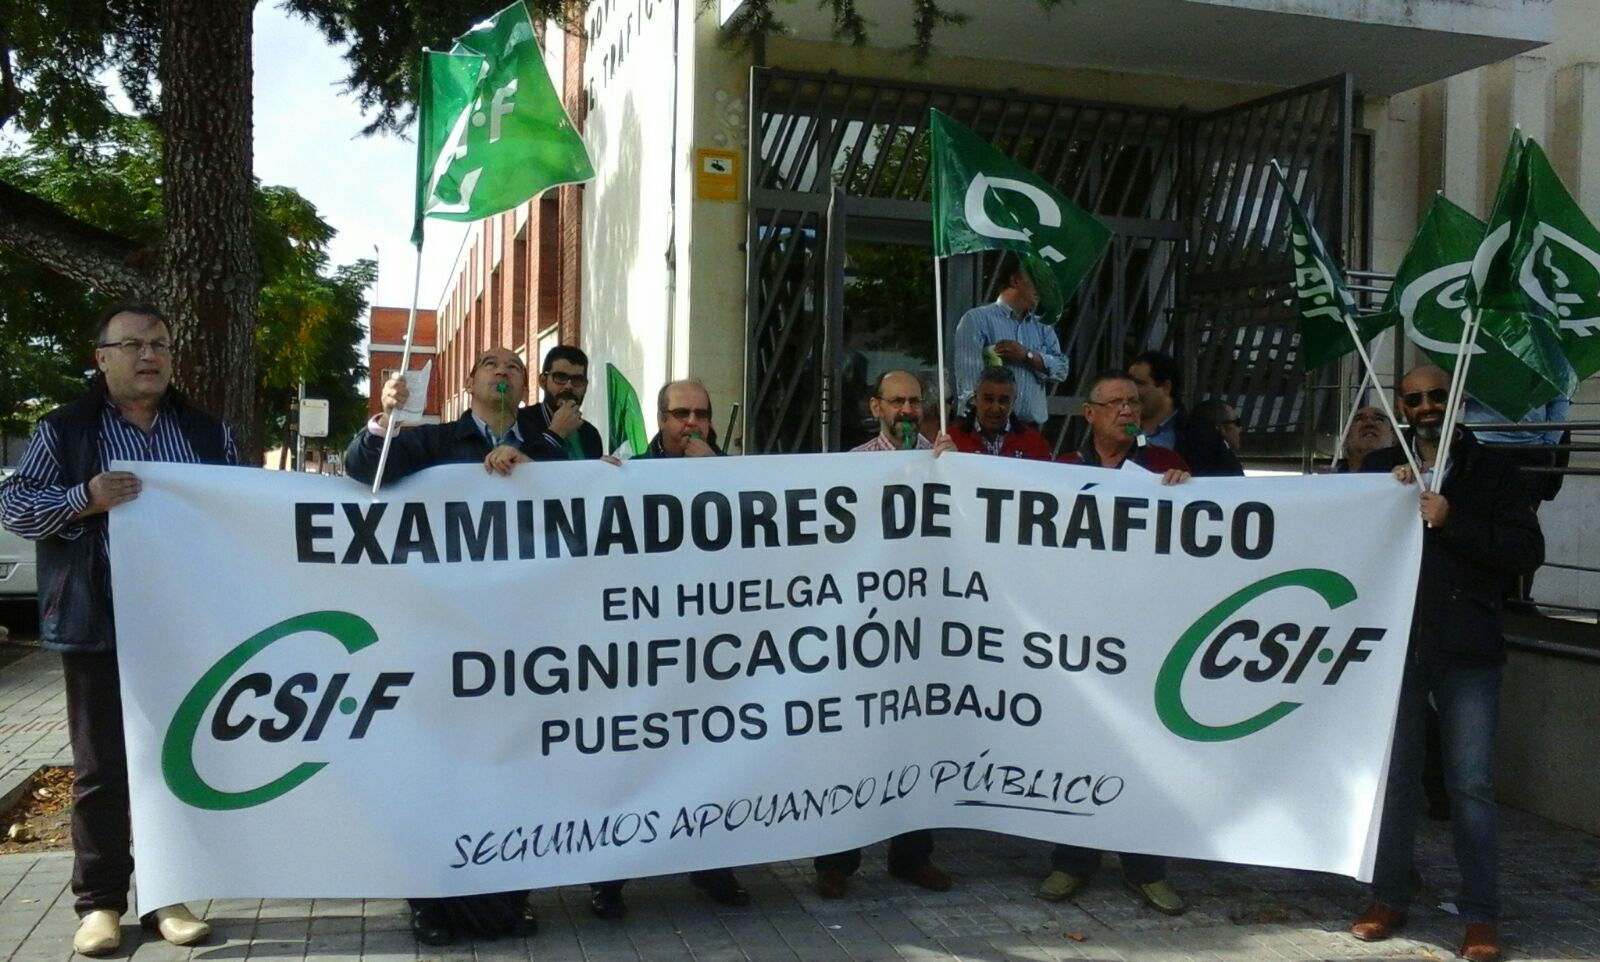 Asociaci n de examinadores de tr fico protestas de for Oficina de trafico en malaga